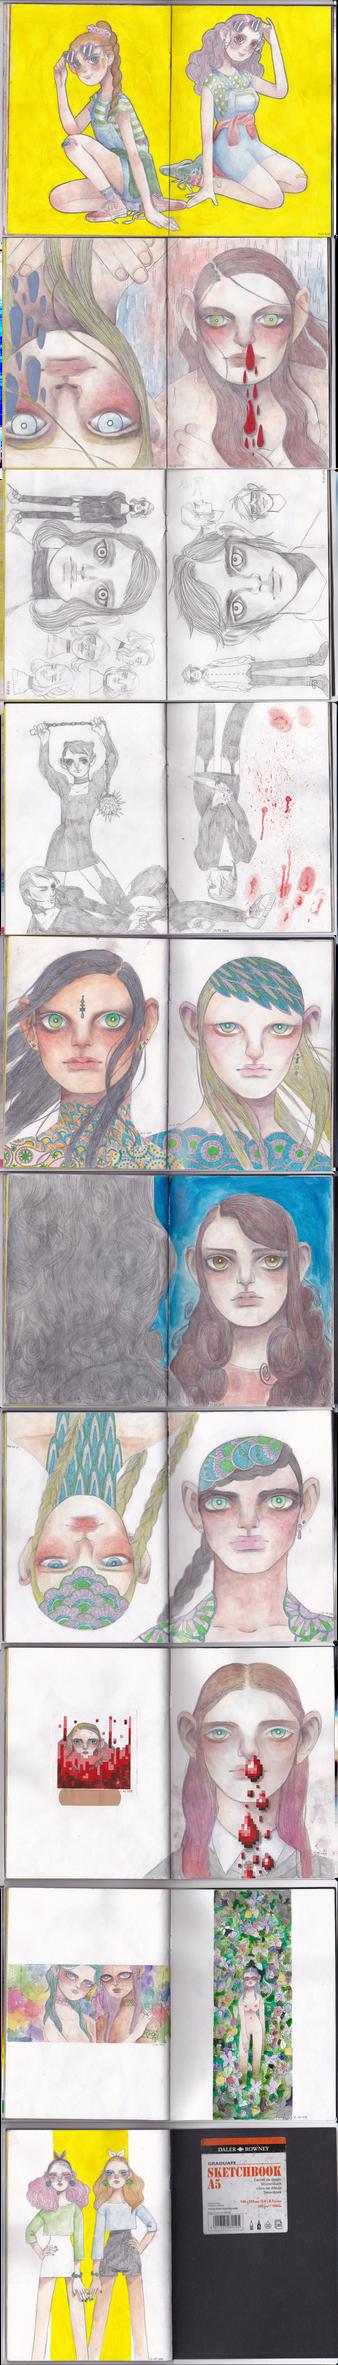 may - aug sketchbook 2 by likrot